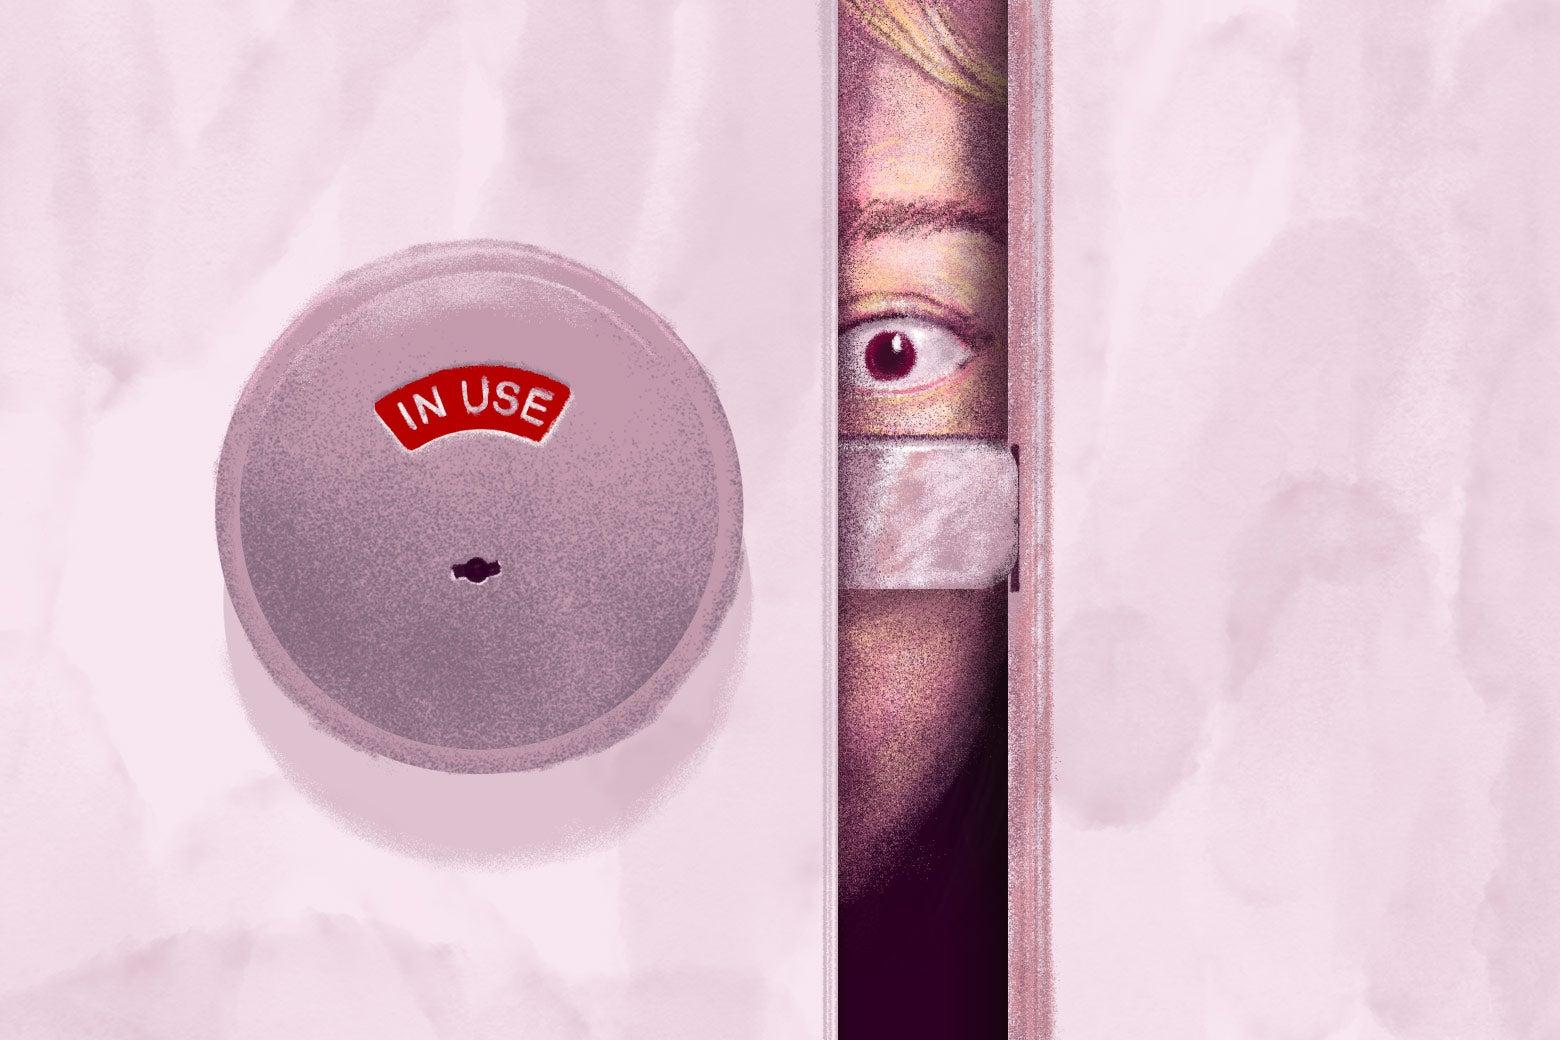 An eye looking through the gap in a bathroom stall door.